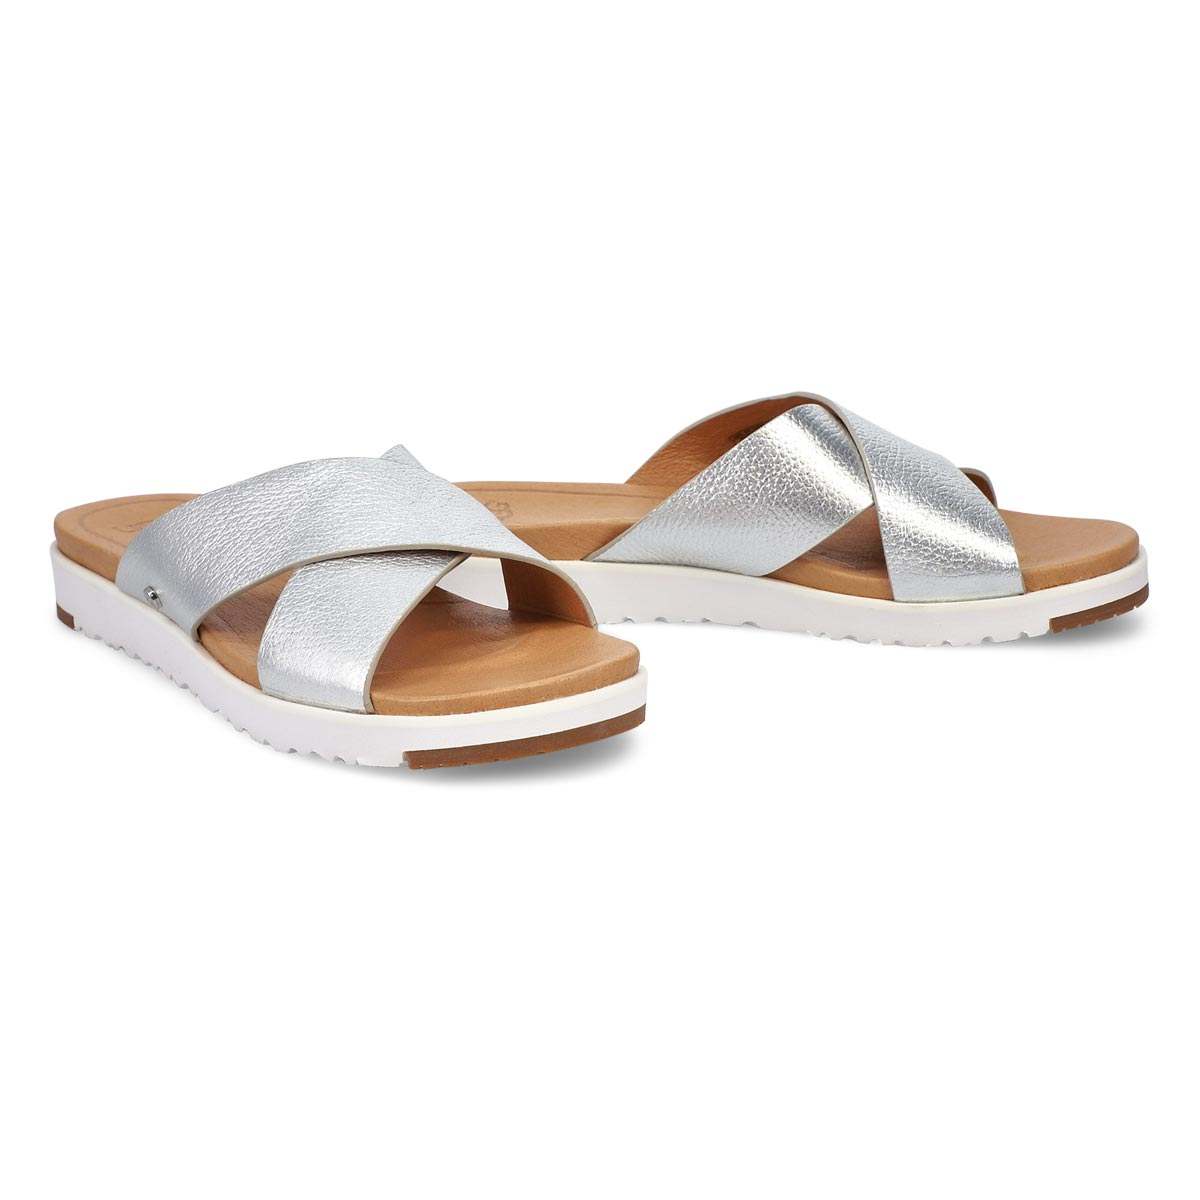 Women's Kari Slide Sandal - Metallic Silver